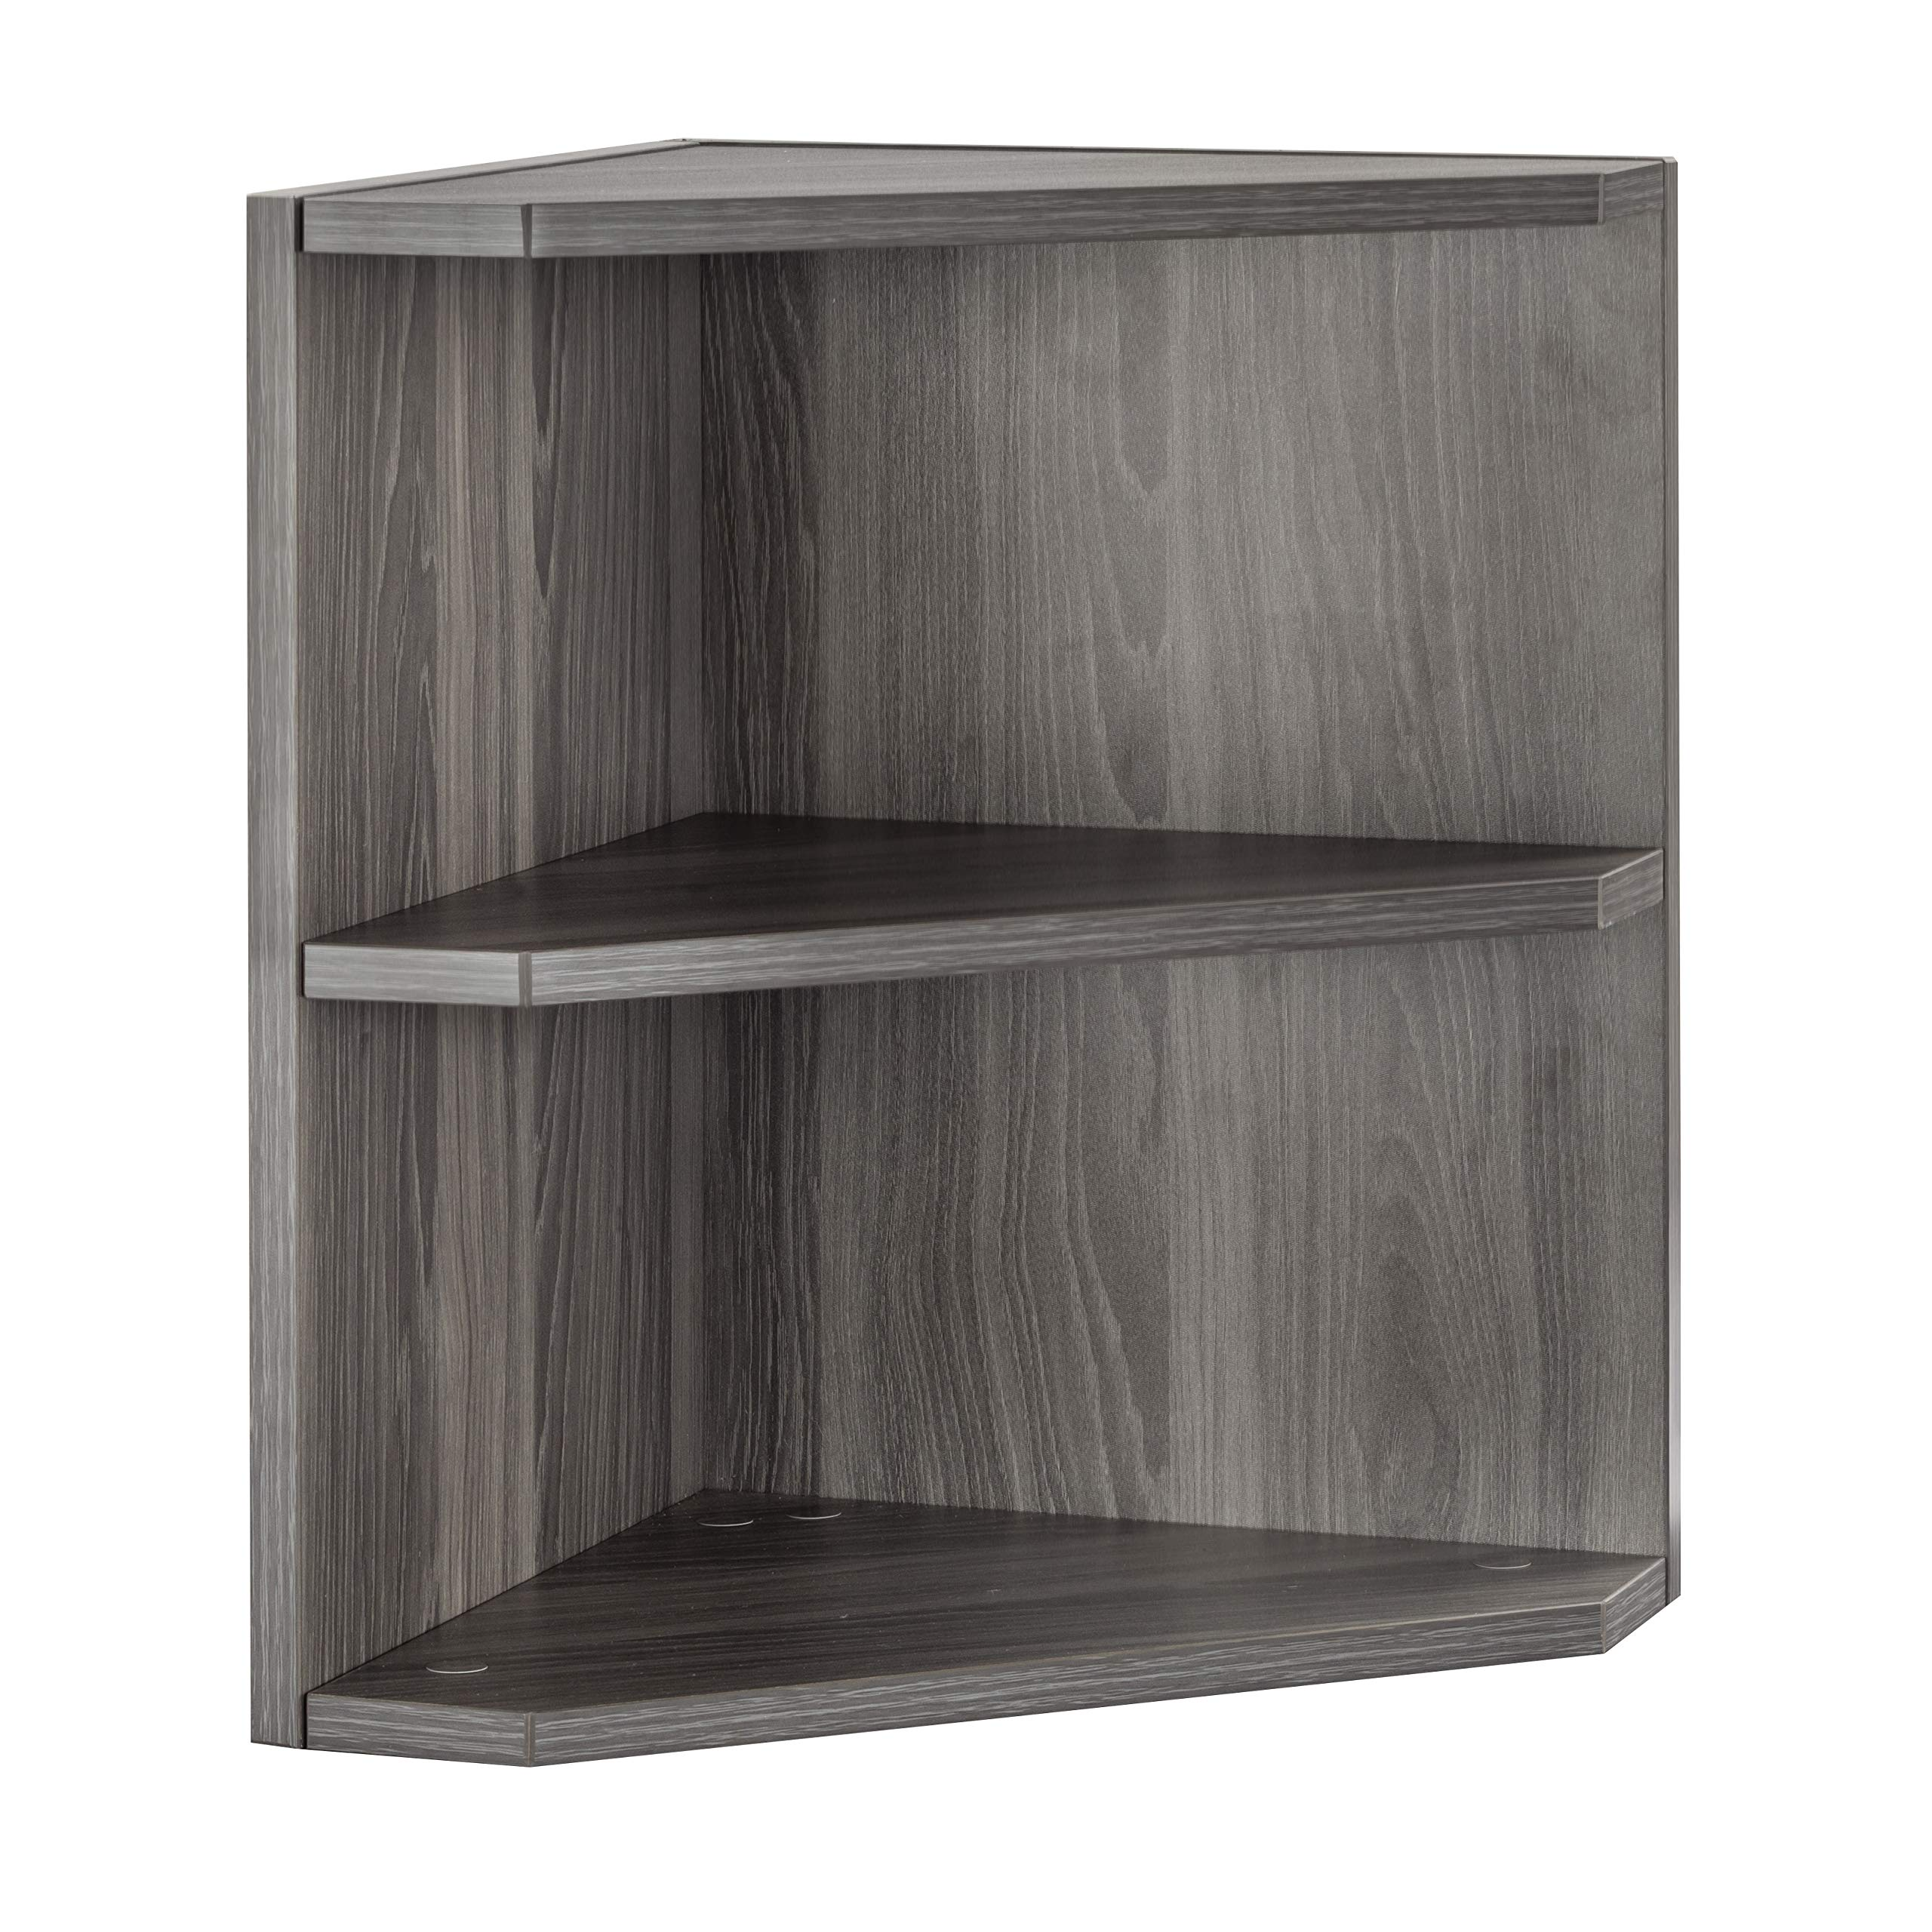 Safco MNPOLGS Medina Hutch Cabinet, Gray Steel Laminate